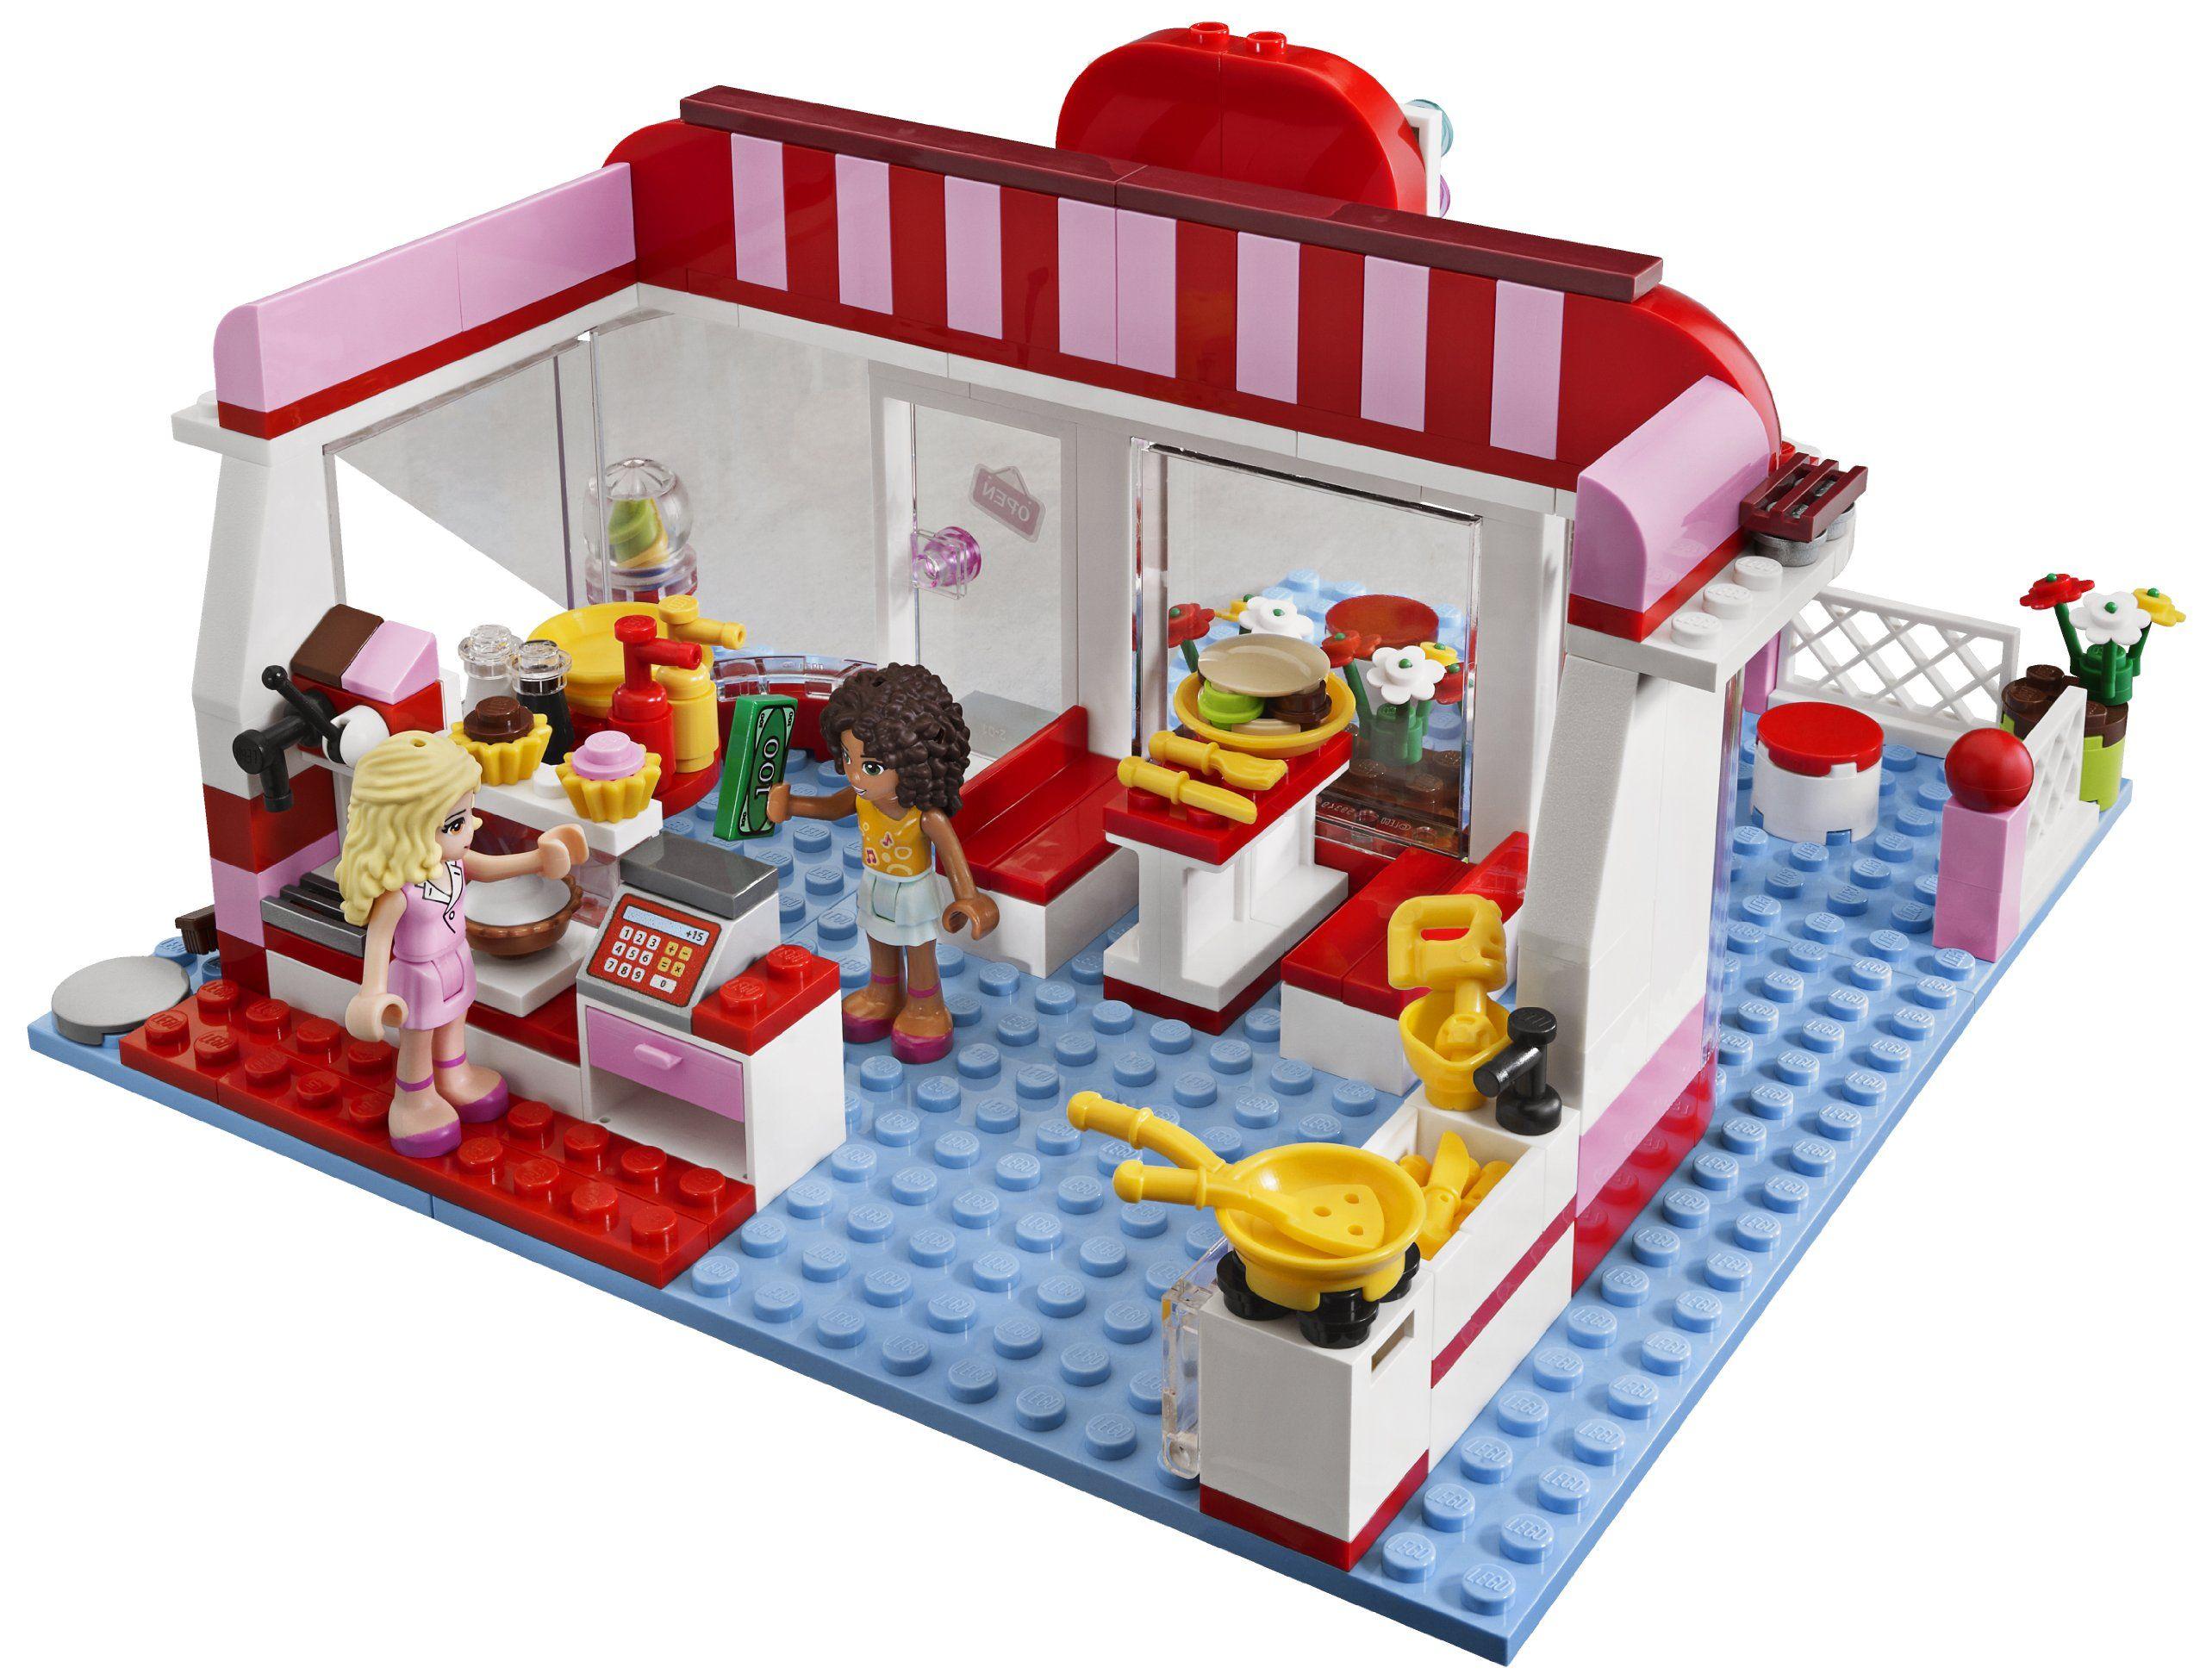 Lego Friends Cafe 3061 Kids Stuff Lego Friends Lego Friends Cafe